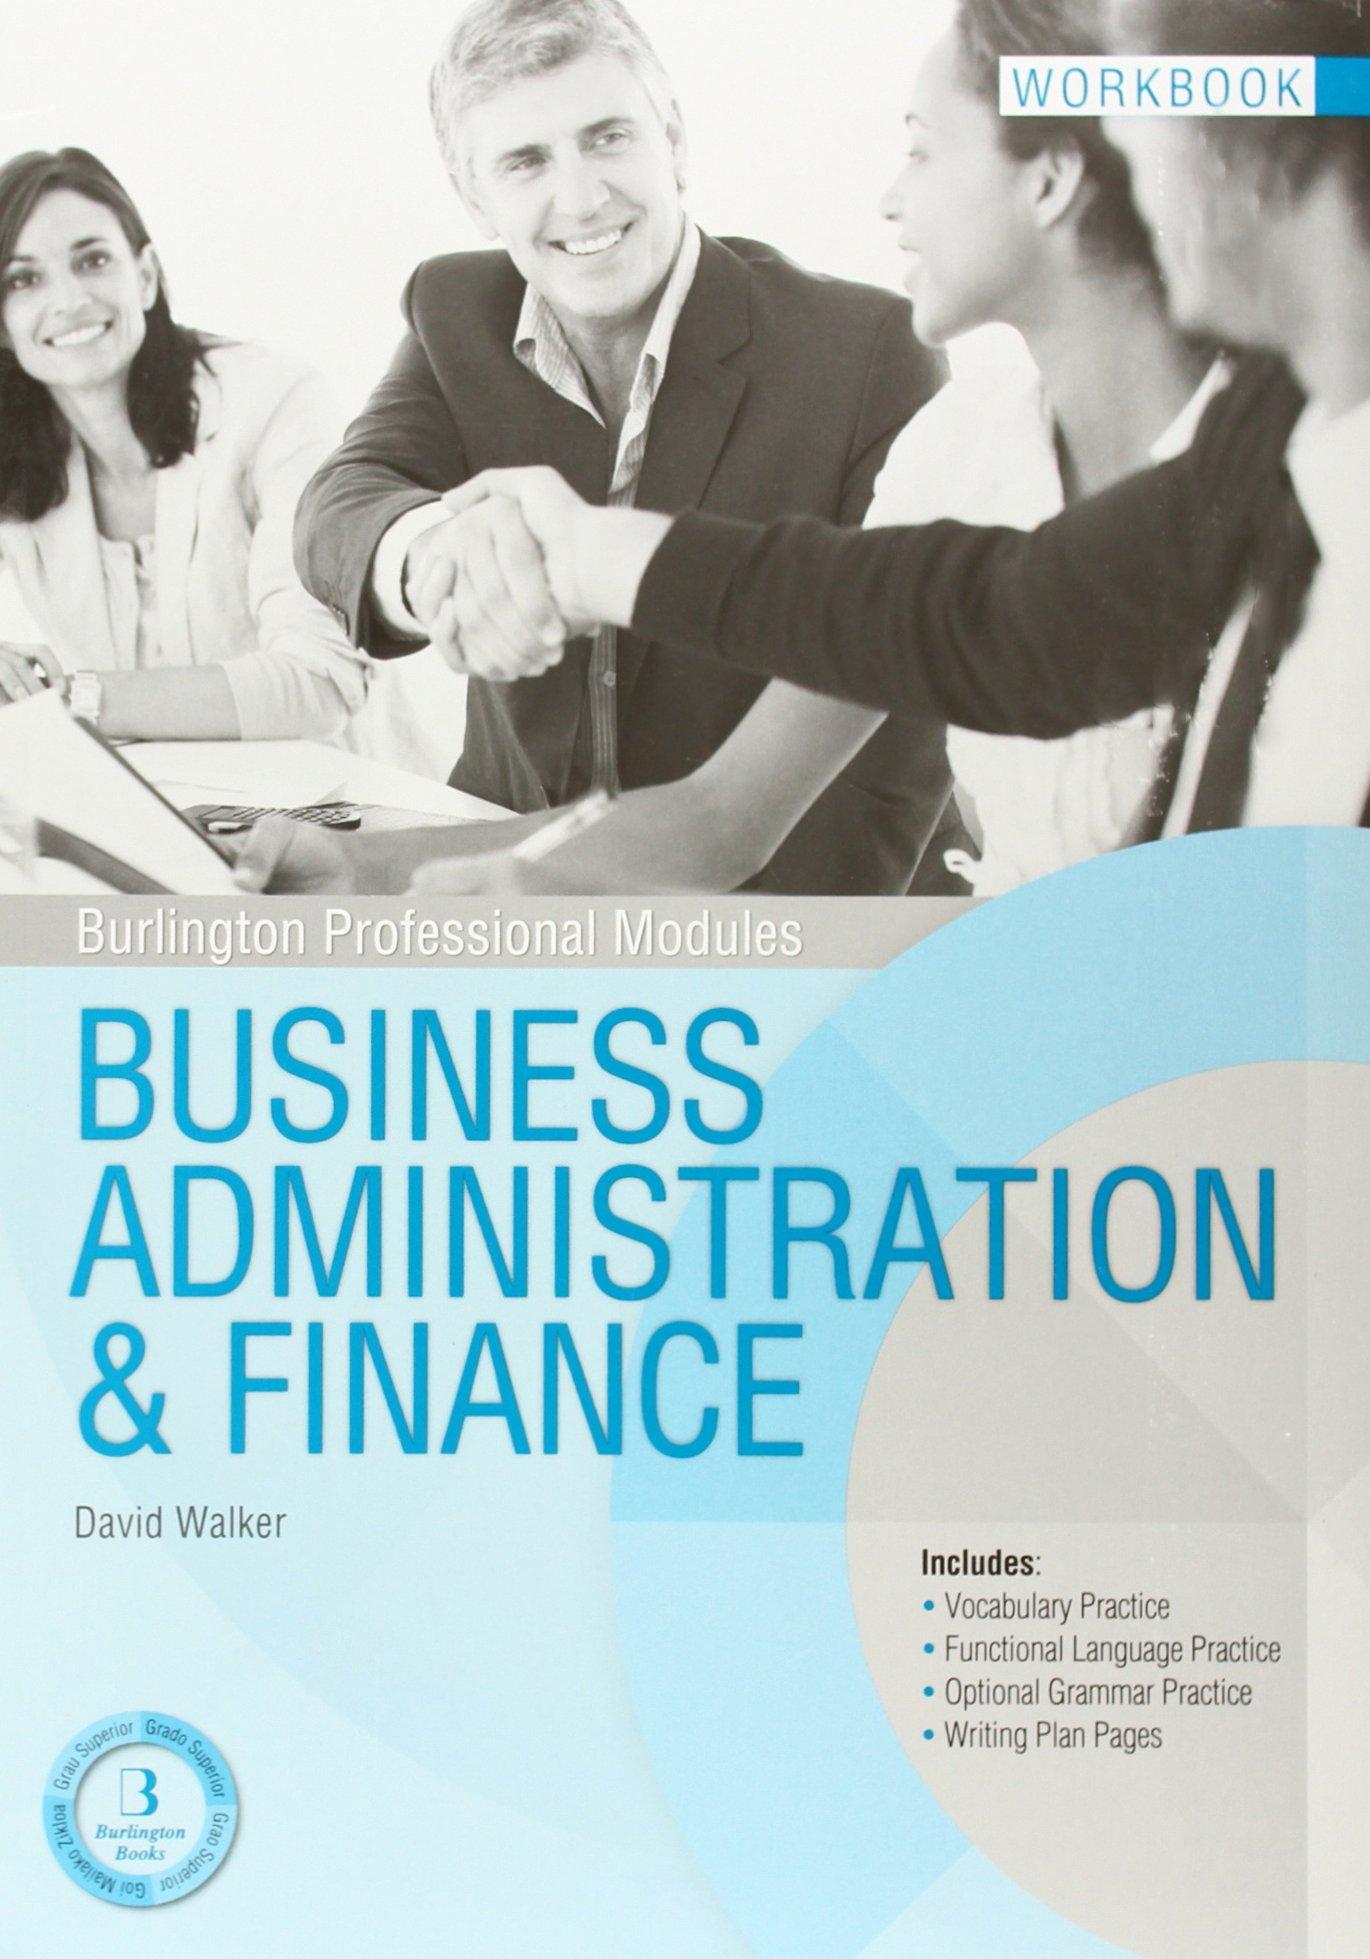 BUSINESS ADMINISTRATION FINANCE WB Burlington Tapa blanda – 1 ene 2013 UNKNOWN BURLINGTON BOOKS ESPA¥A S.L. 9963510566